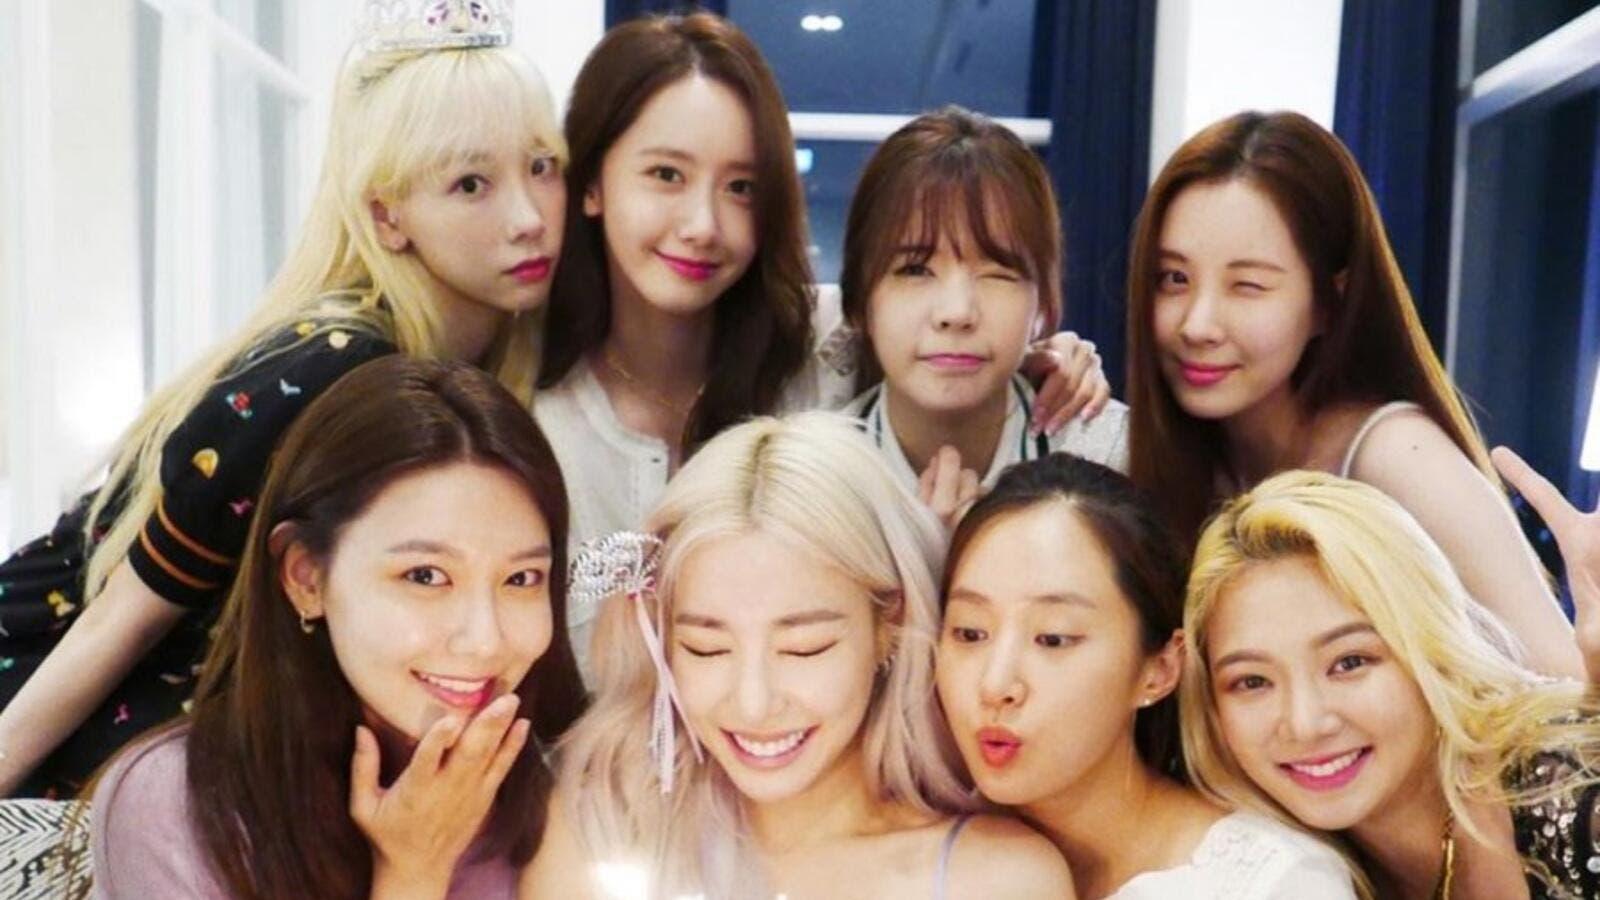 Girls' Generation Member Taeyeon Shares Tease for Upcoming